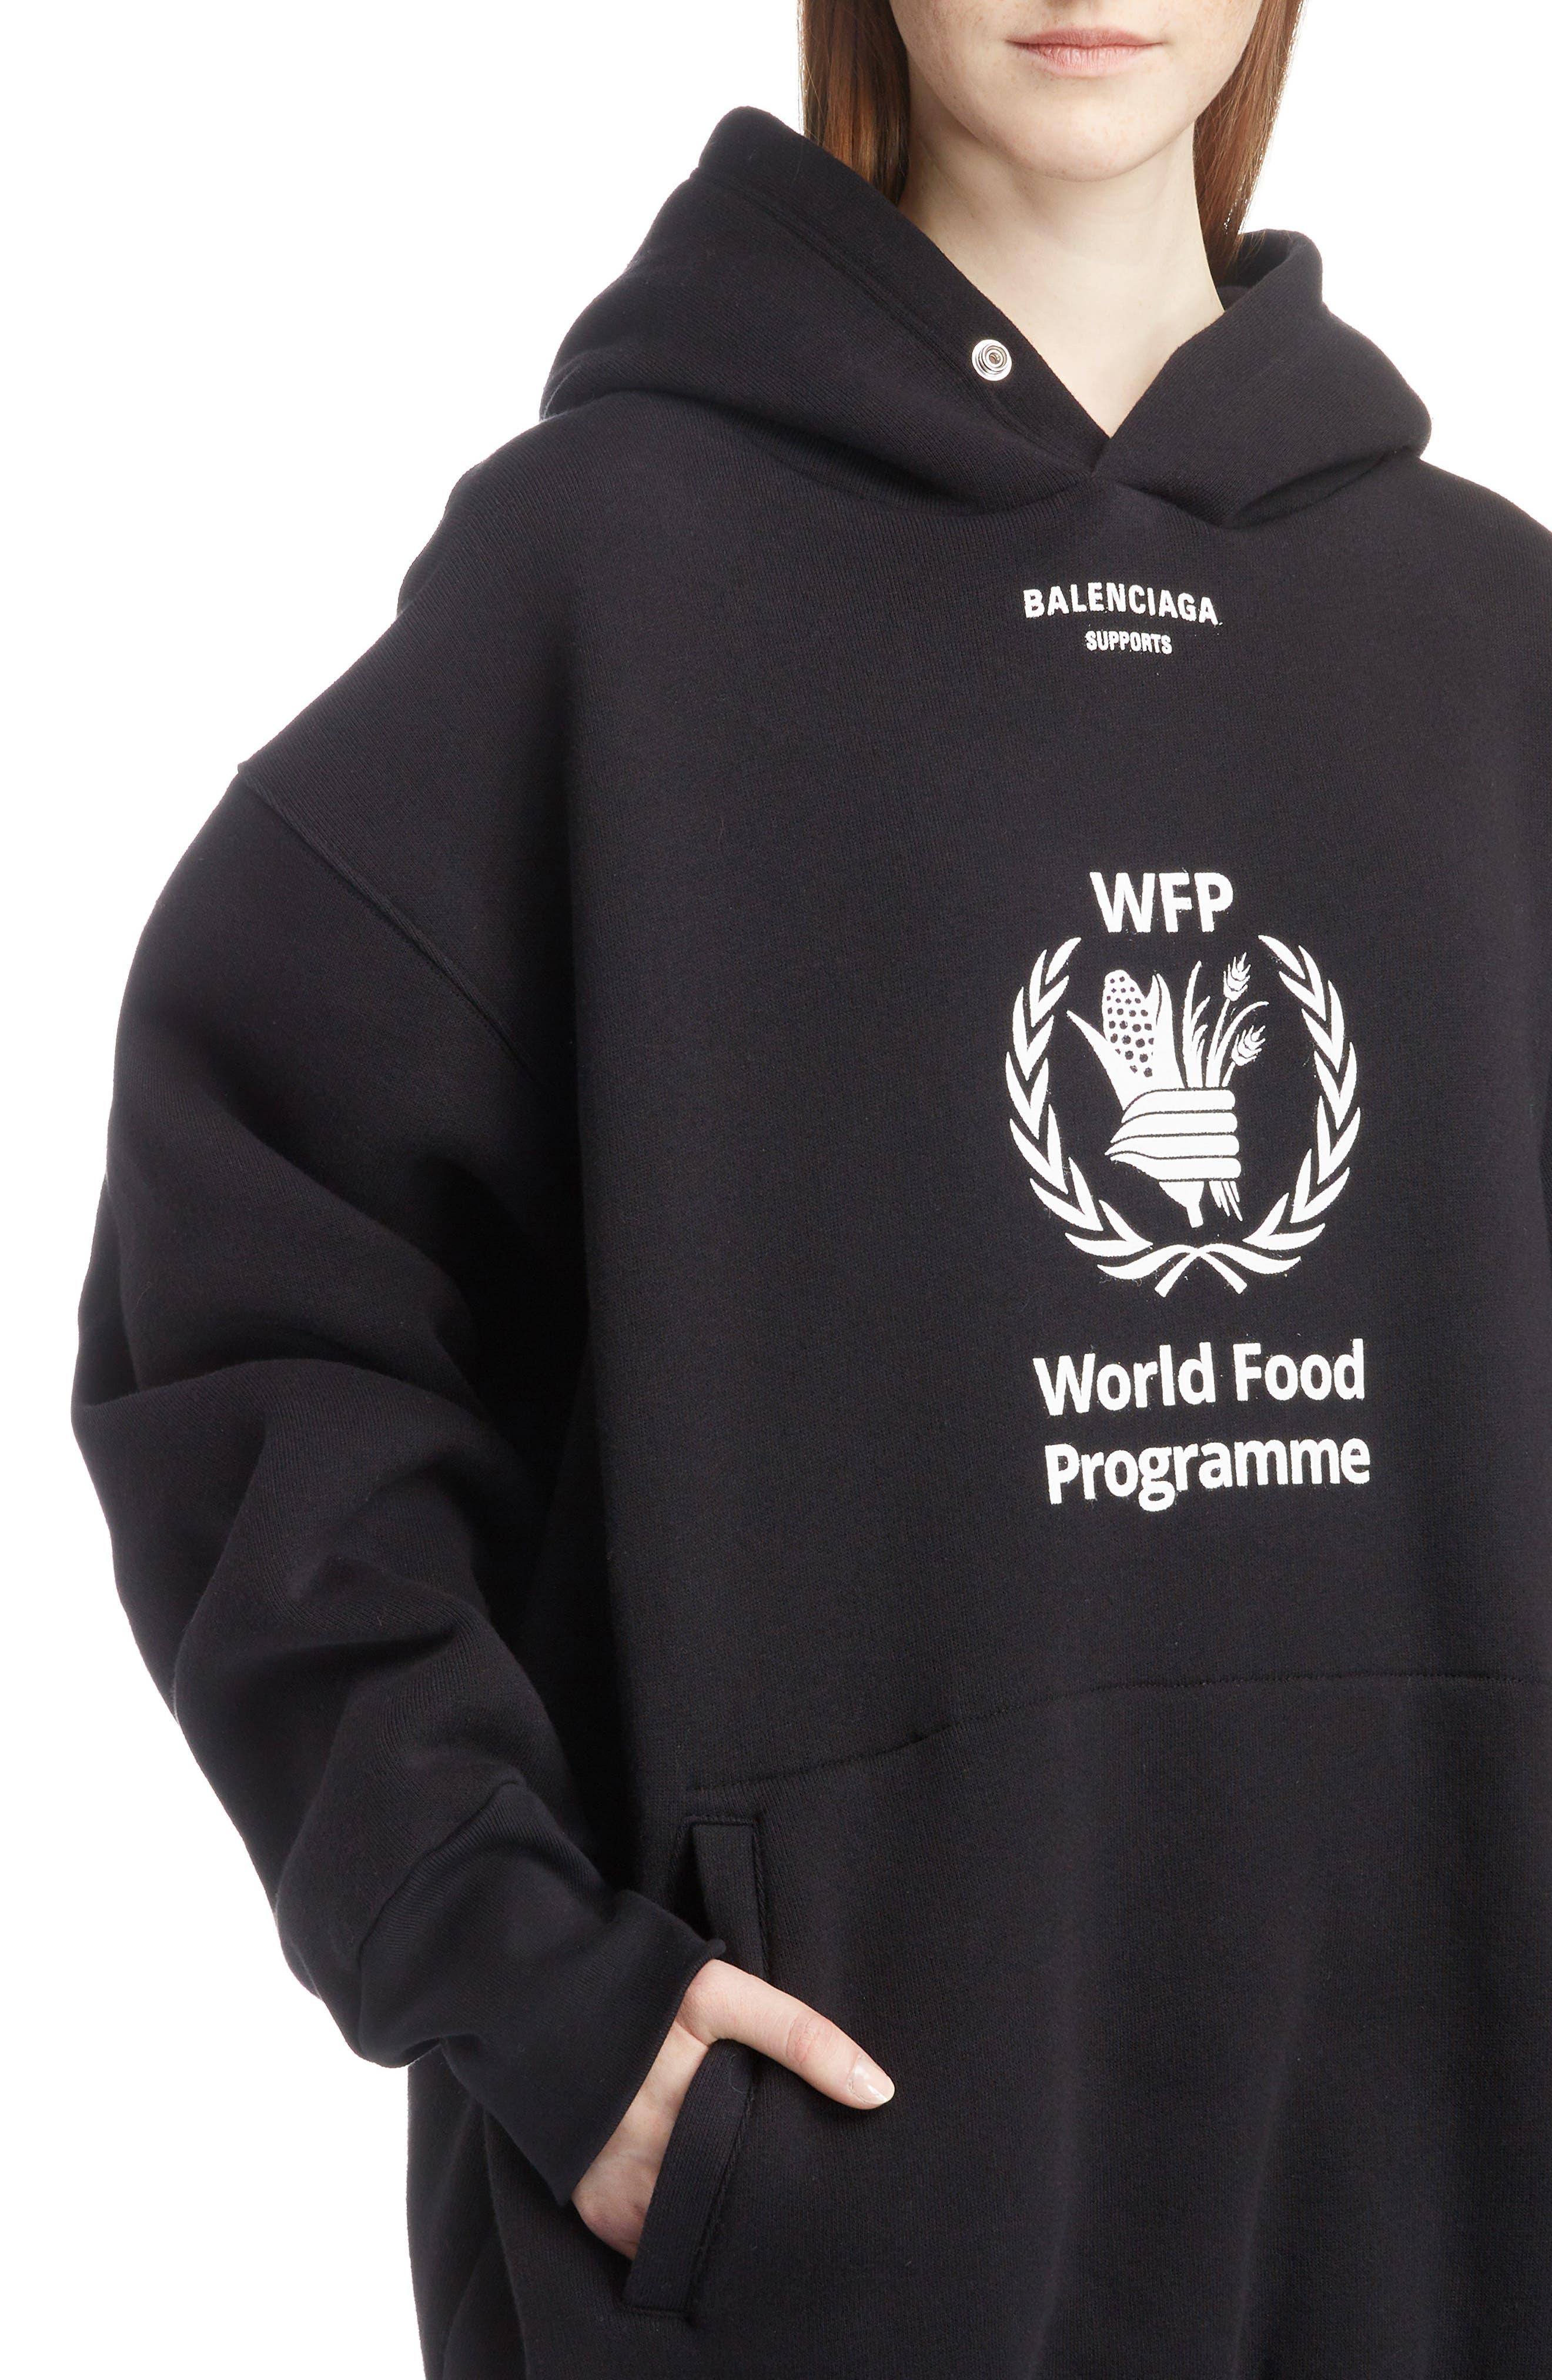 World Food Programme Oversize Brushed Felt Hoodie,                             Alternate thumbnail 4, color,                             1070-BLACK/ WHITE